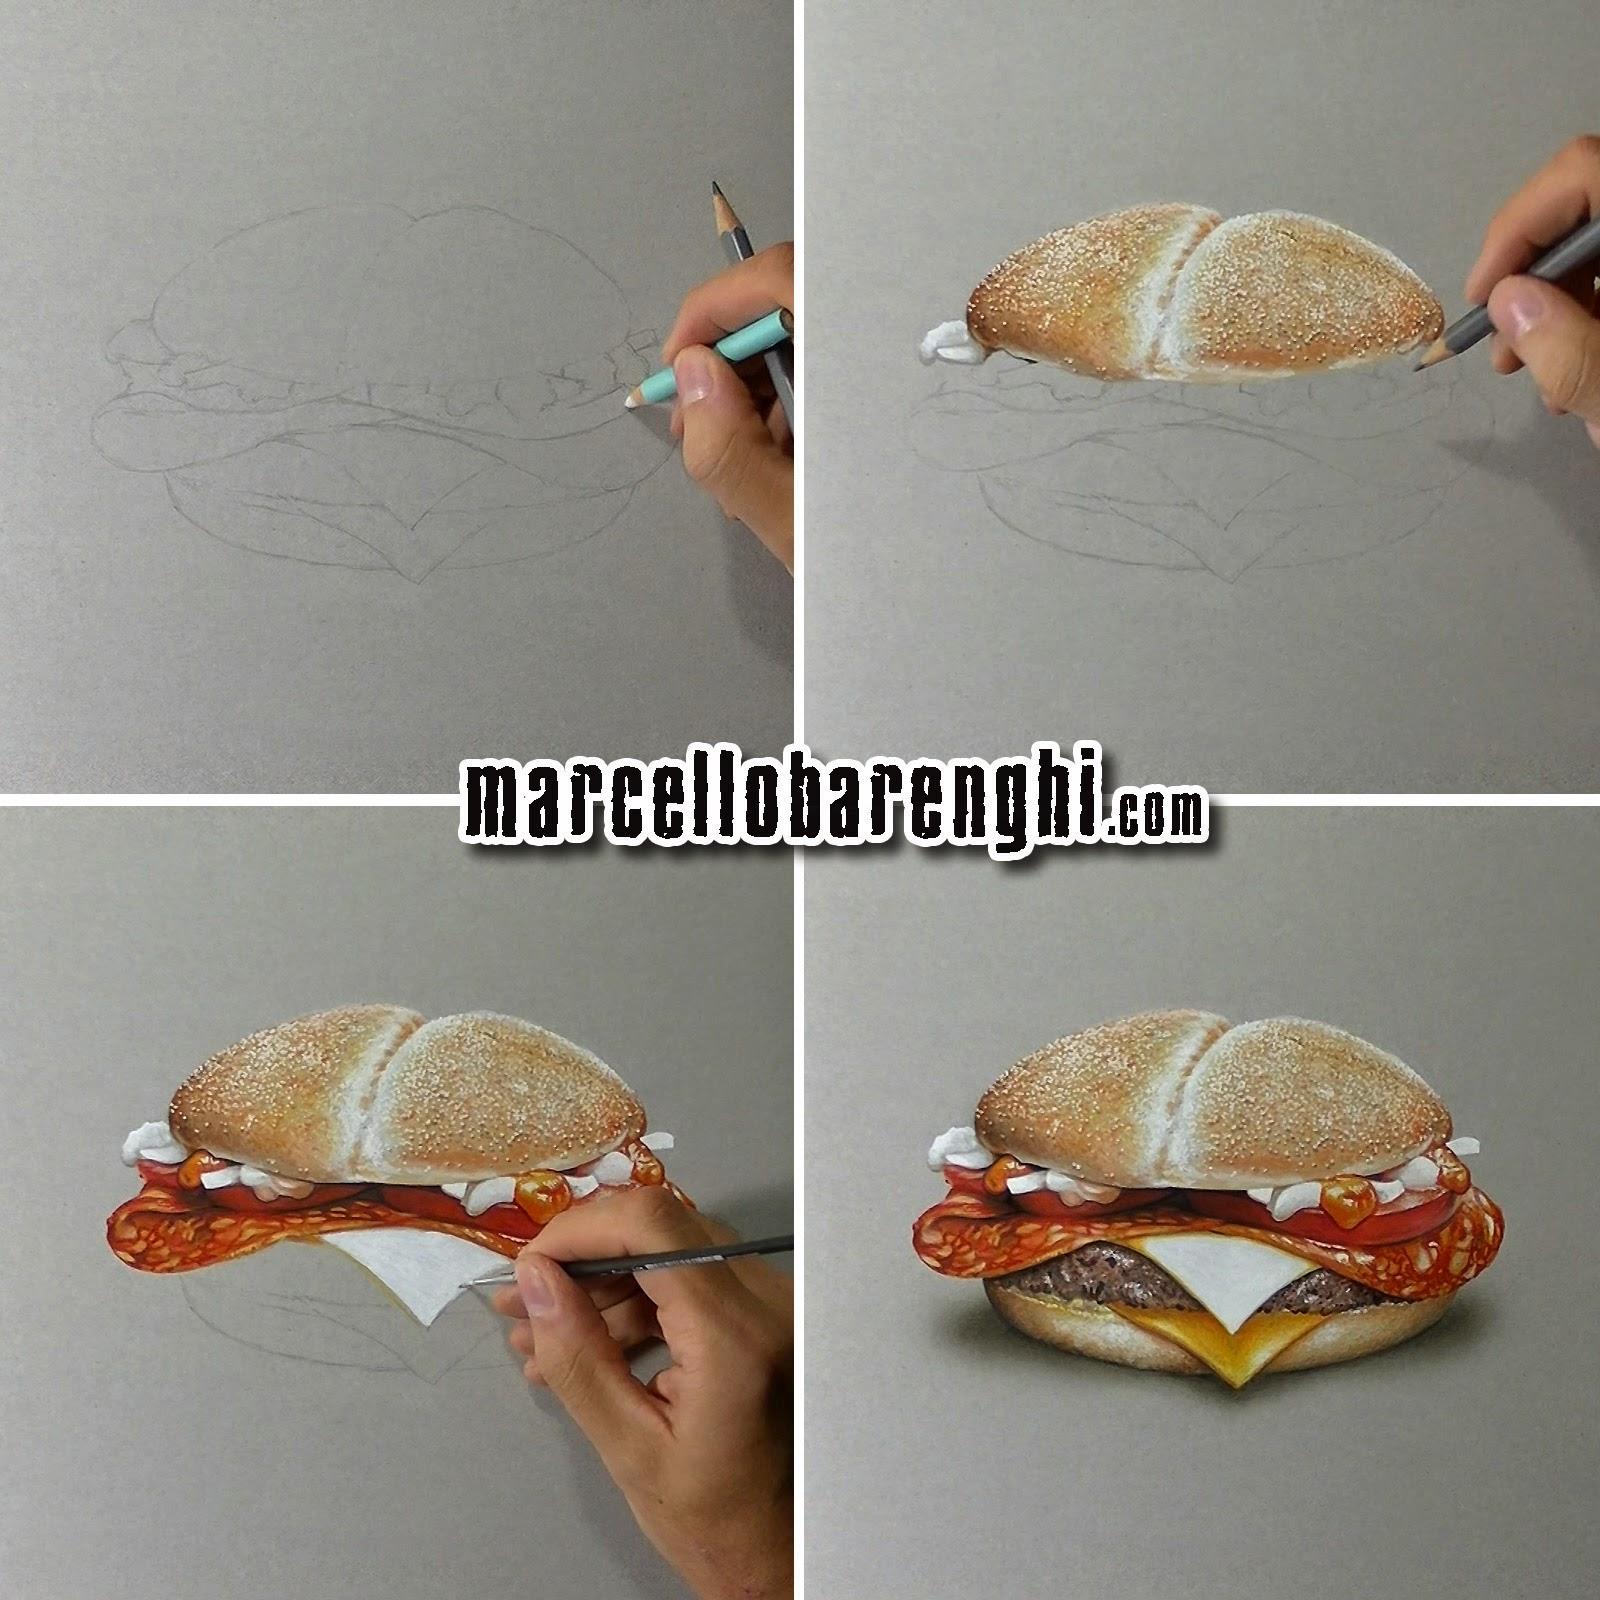 art drawings paintings sketches realistic hyper art hamburger